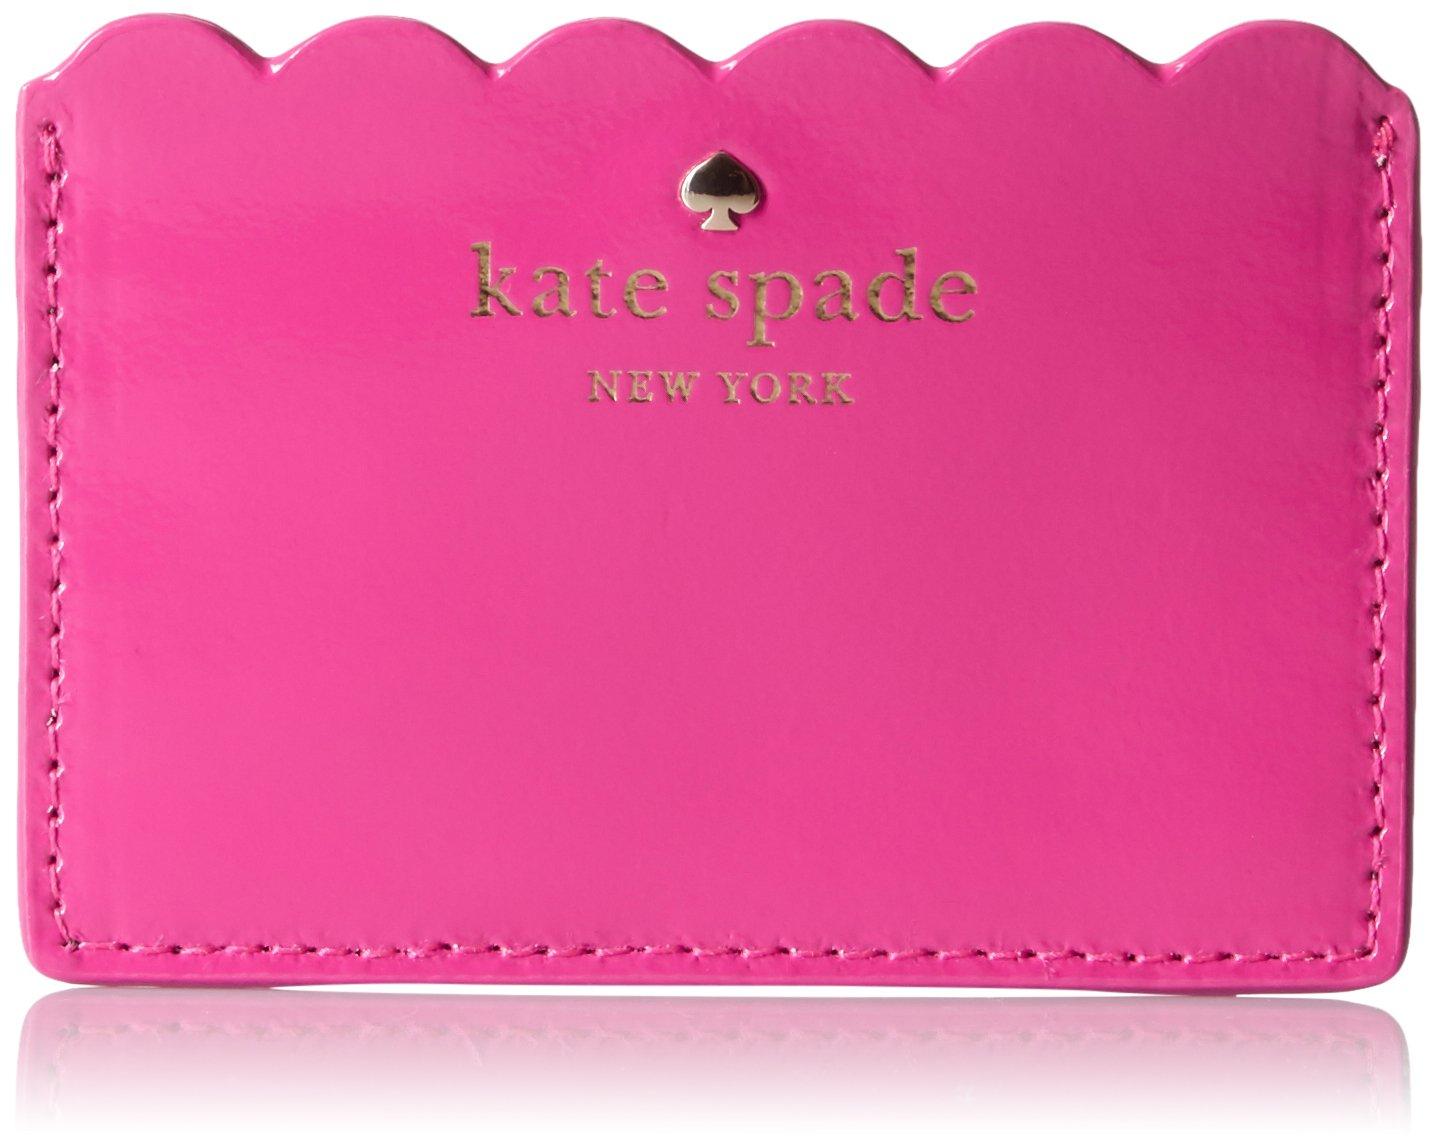 kate spade new york Women's Lily Avenue Patent Card Holder, Radish/Mahogany One Size